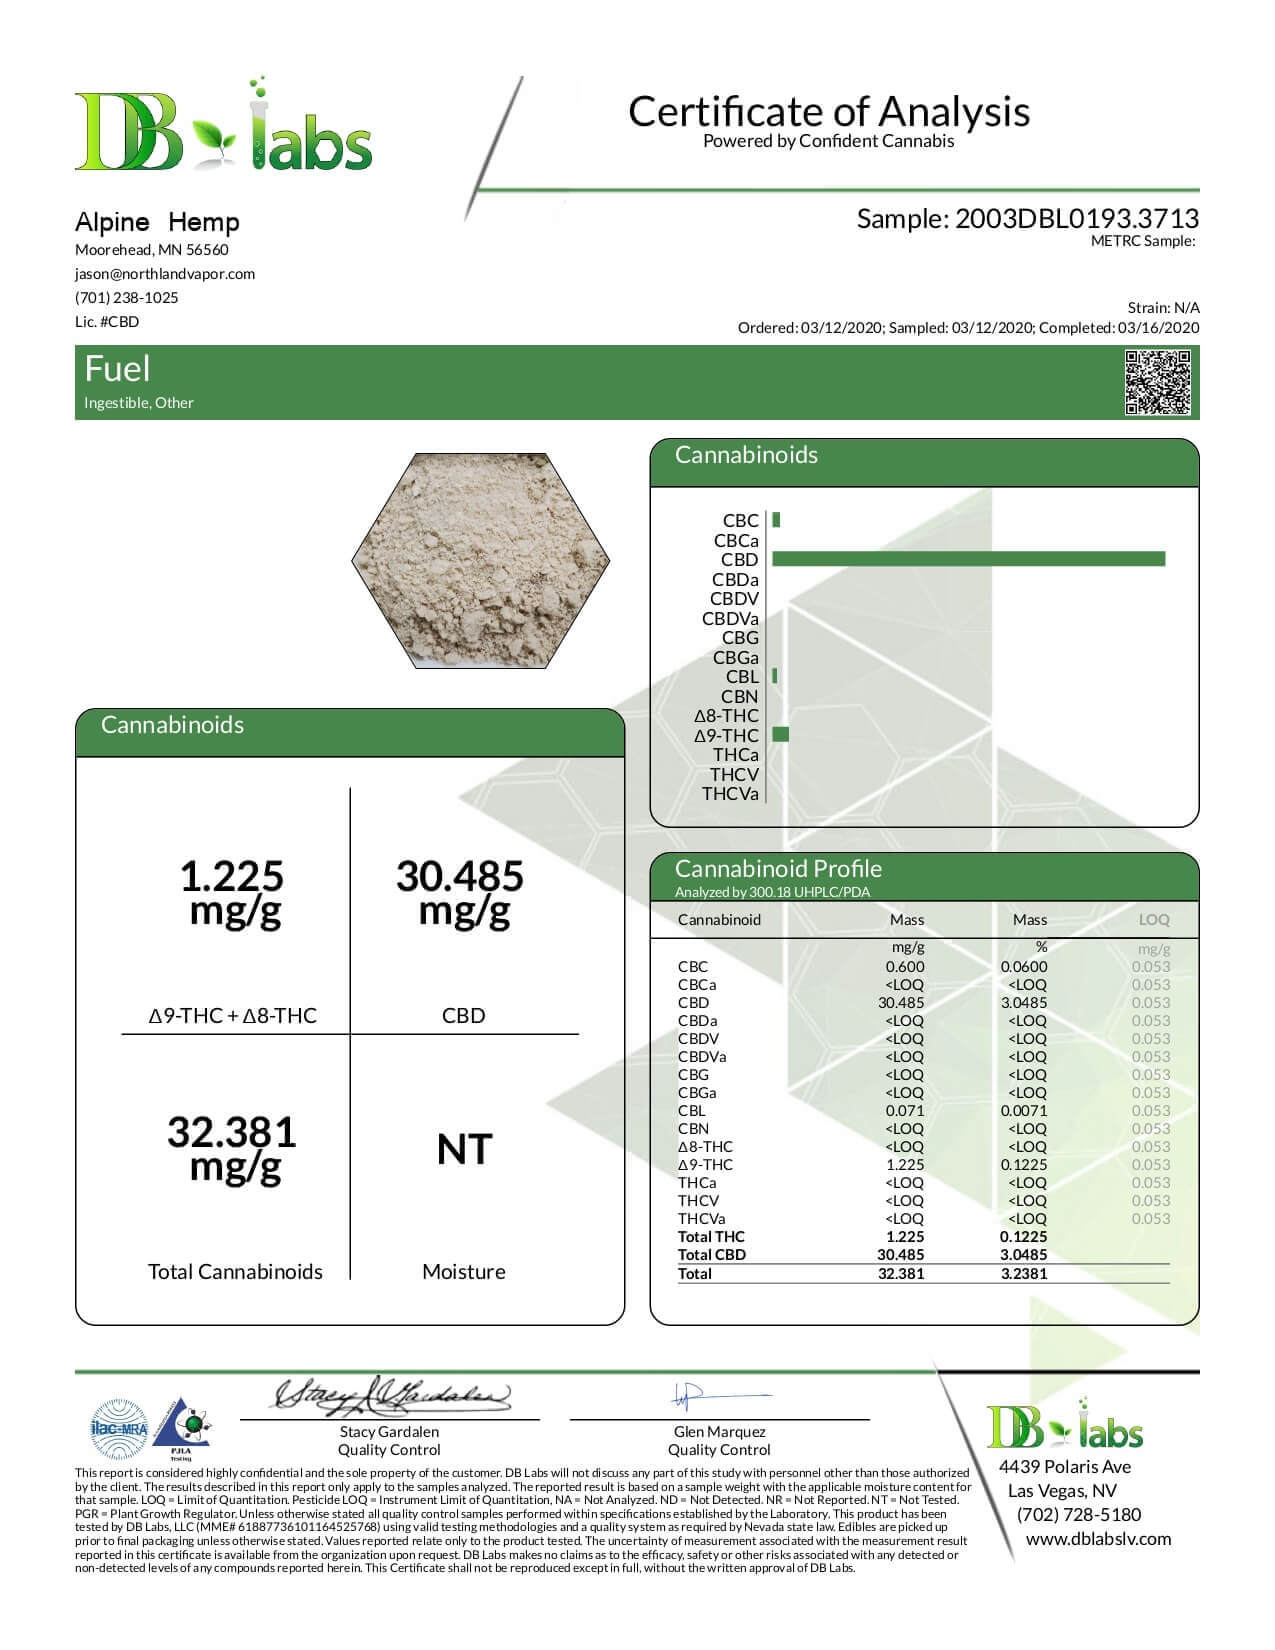 Alpine Hemp CBD Capsule Fuel Lab Report